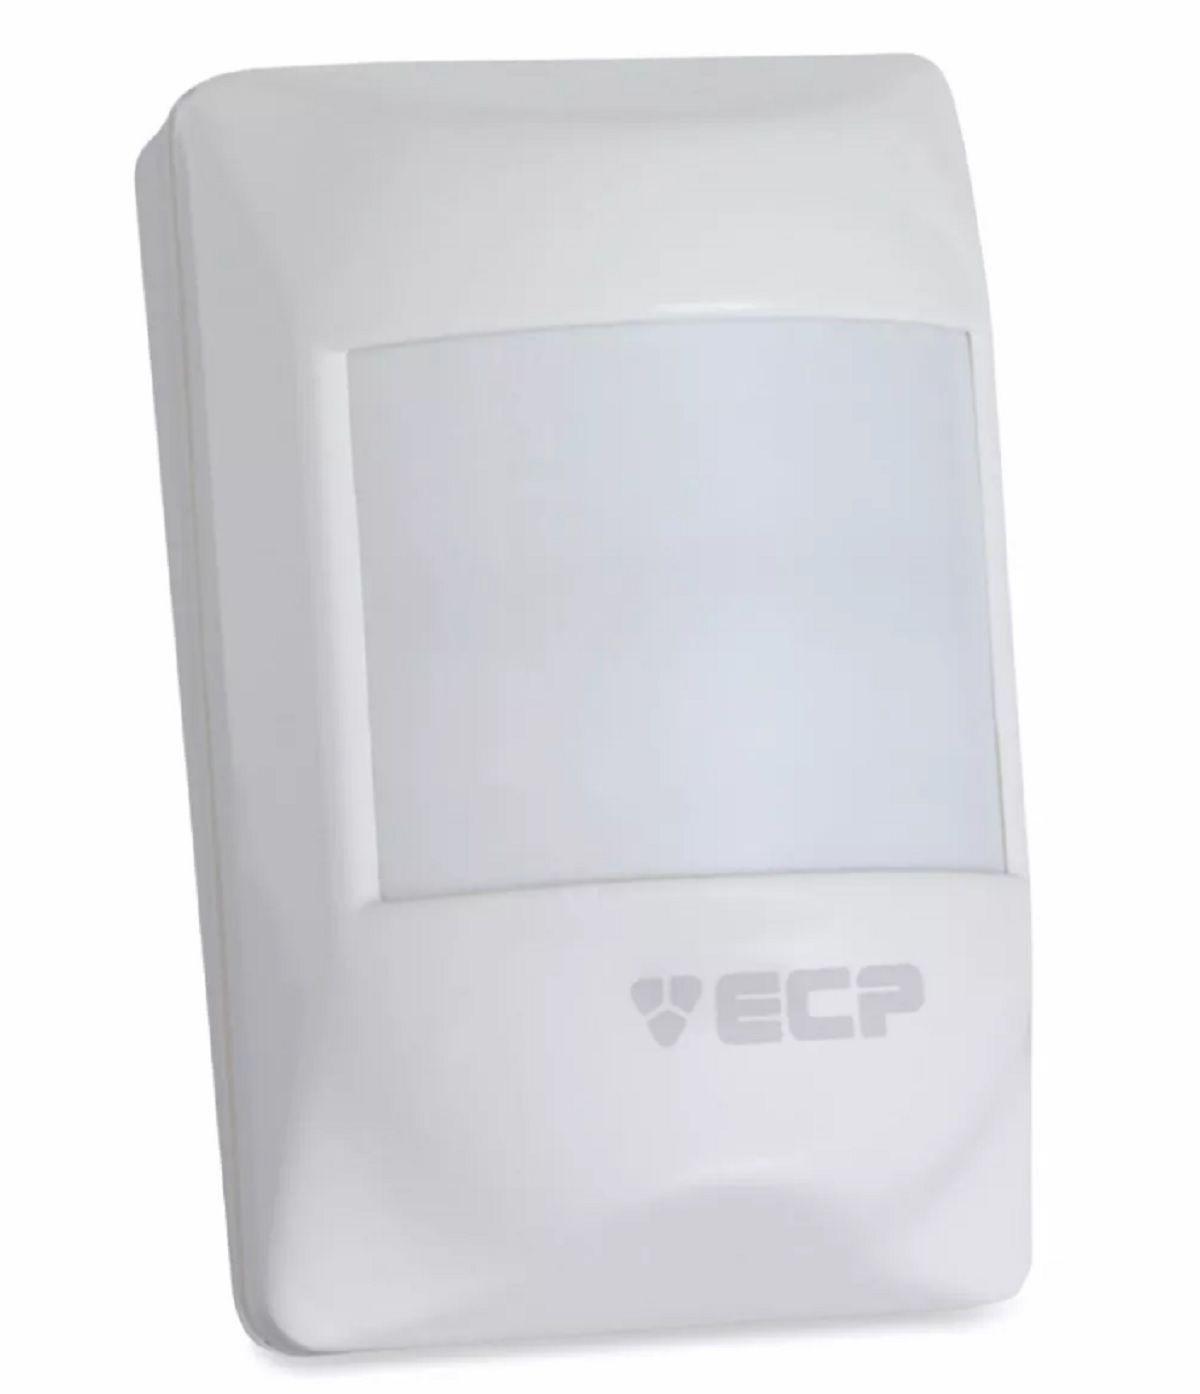 Kit Alarme Residencial Ecp Master 6 Sensores Sem Fio